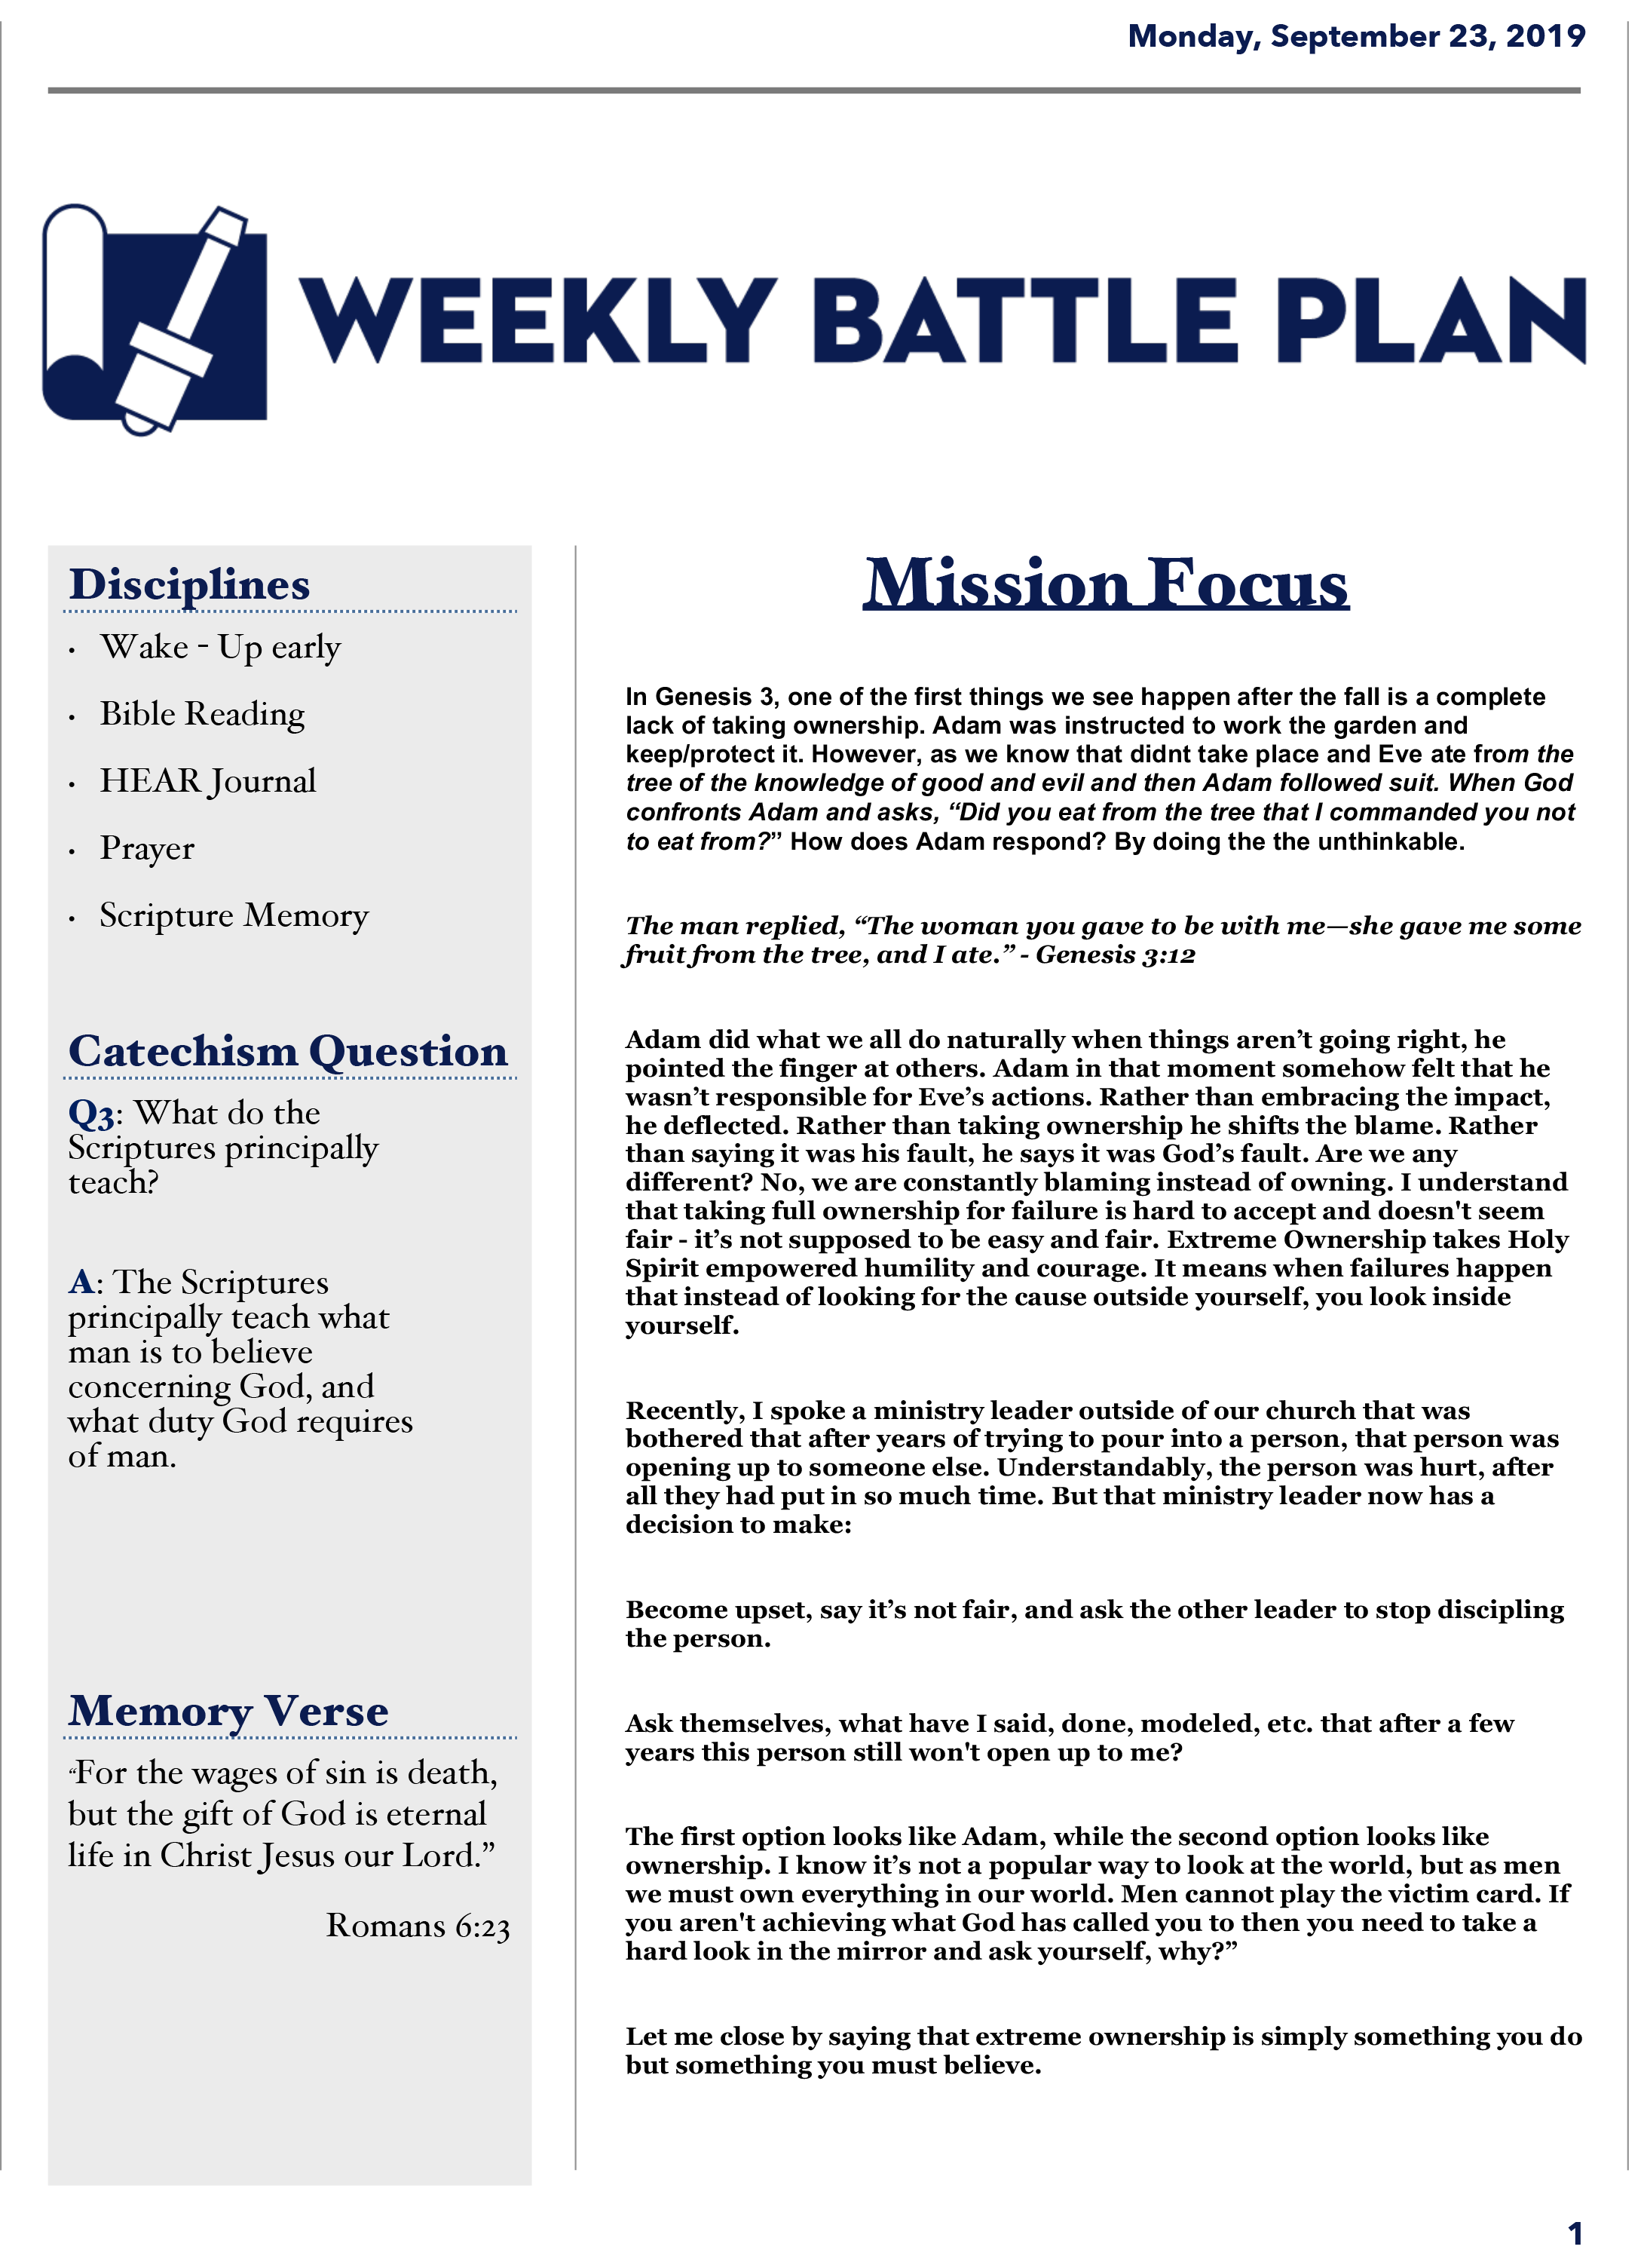 Battle Plan (9.23.19)-1.png